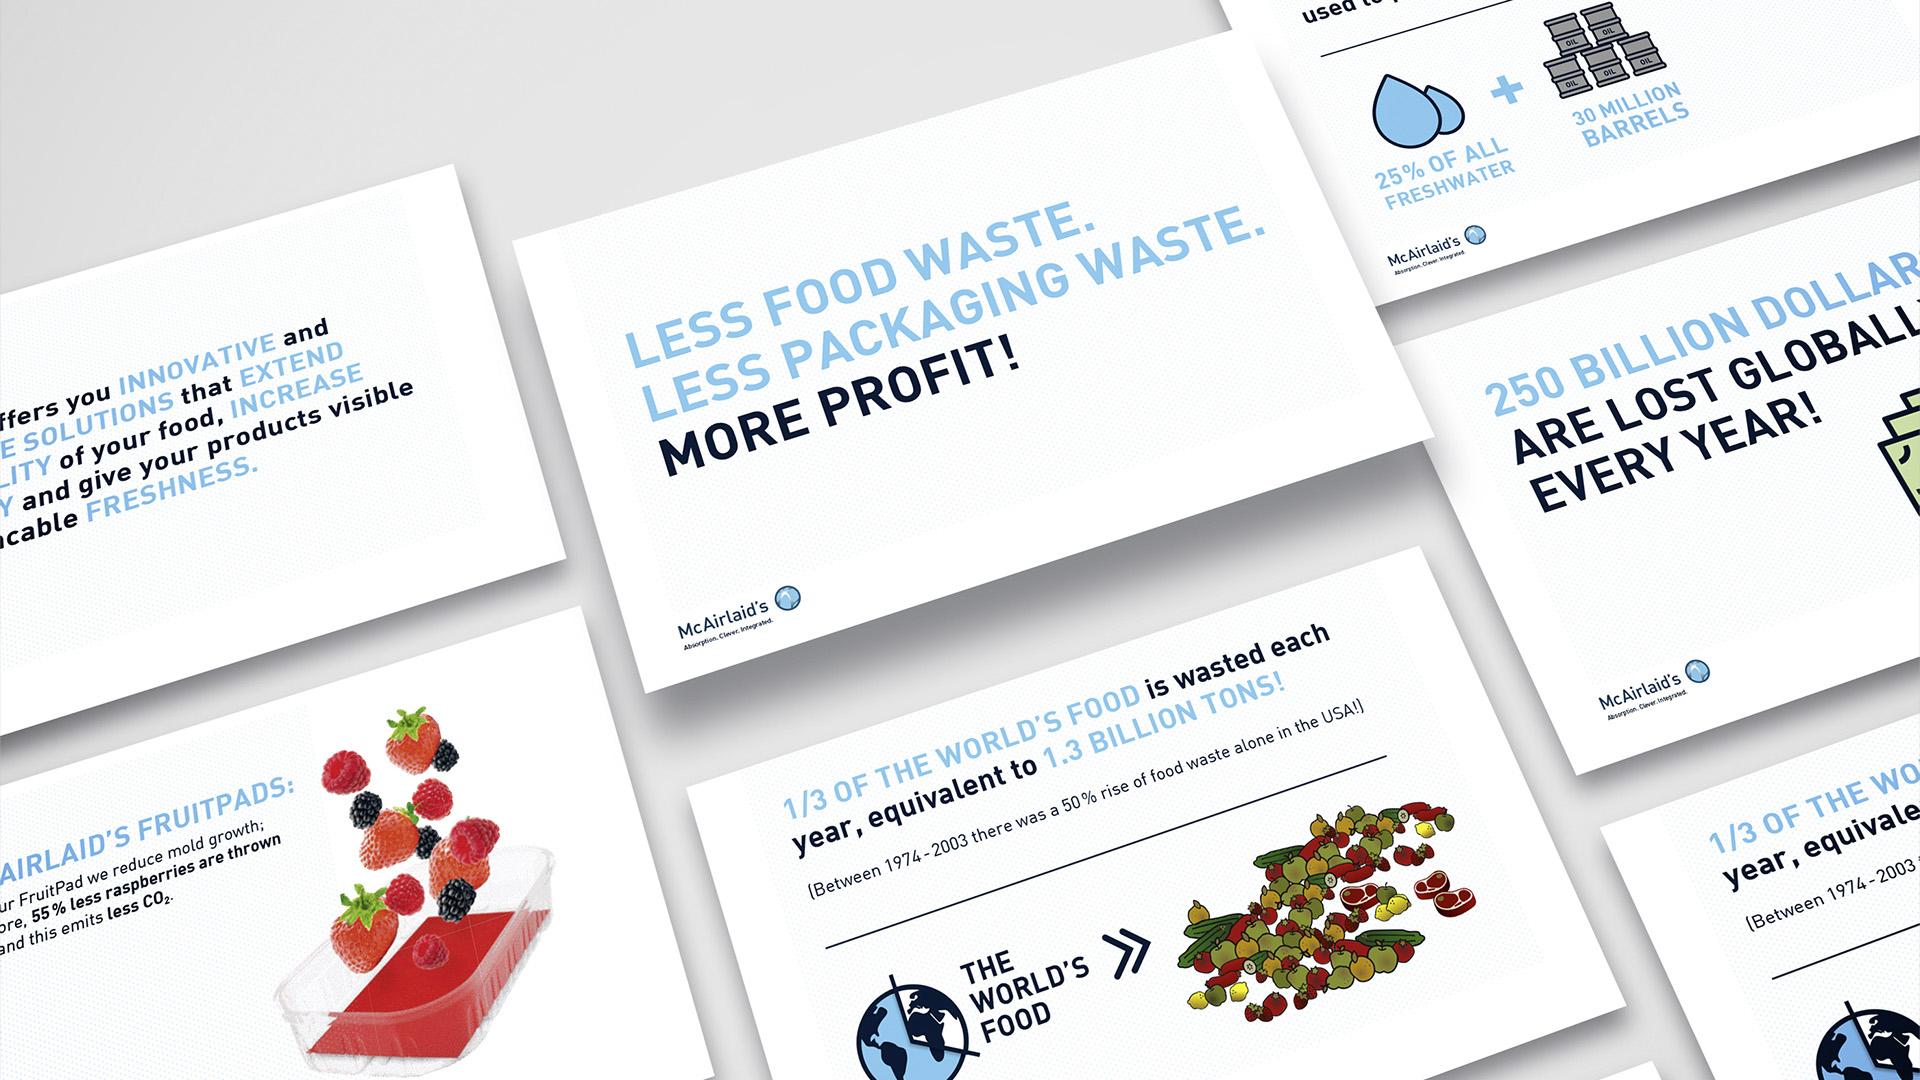 McAirlaids Foodwaste Präsentation